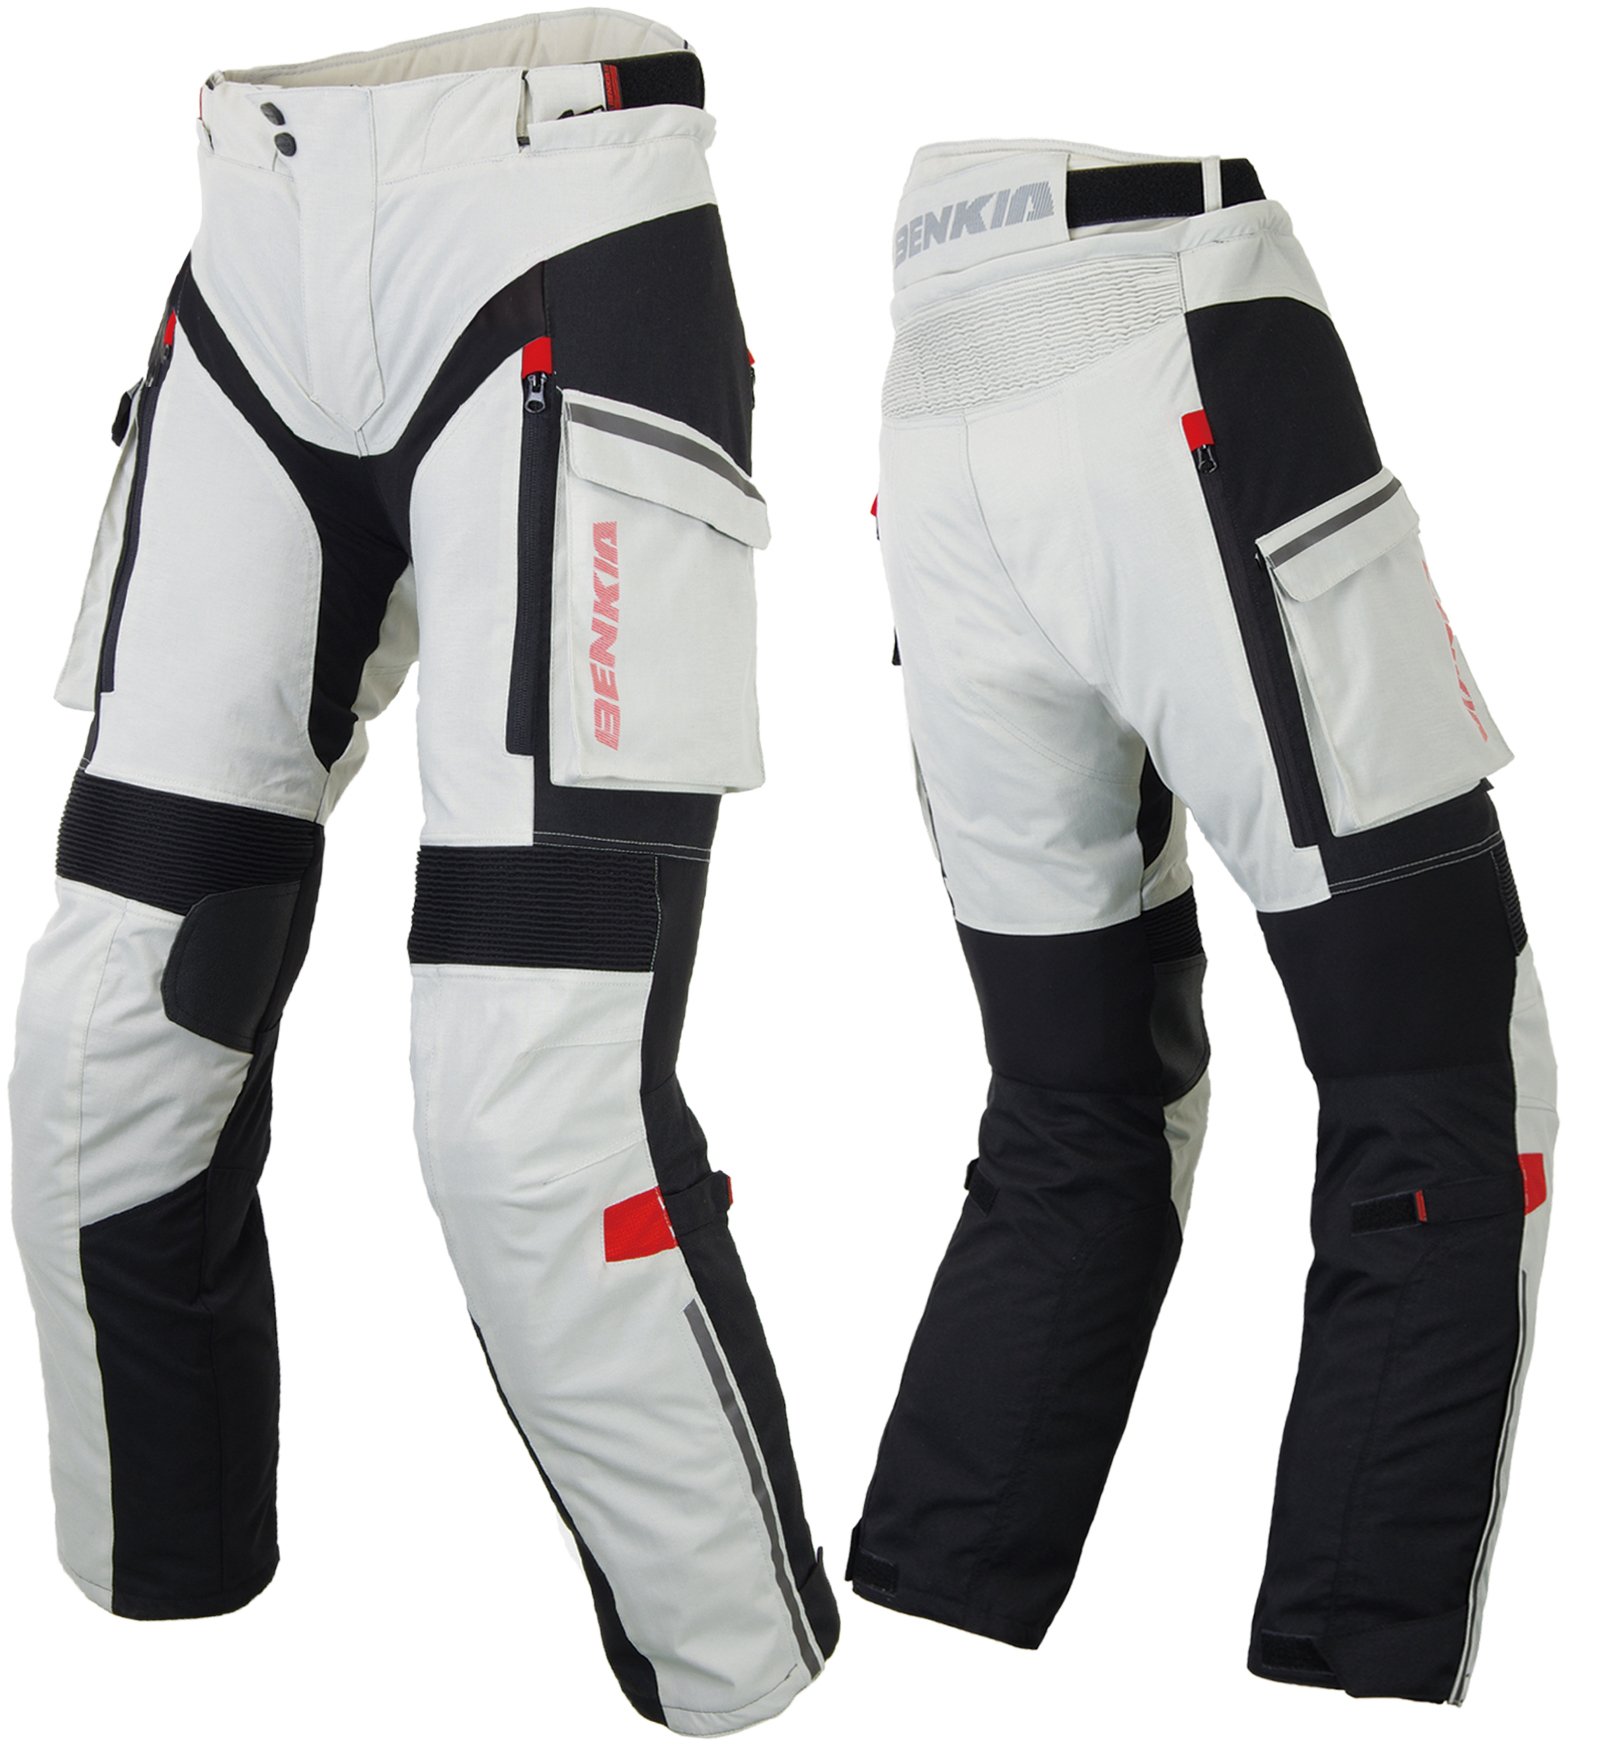 BENKIA Uomini Motociclismo Pantaloni Inverno Rally Pantaloni Con Staccabile Fodera Calda Off Road Motocross Pantaloni Pantalon Moto